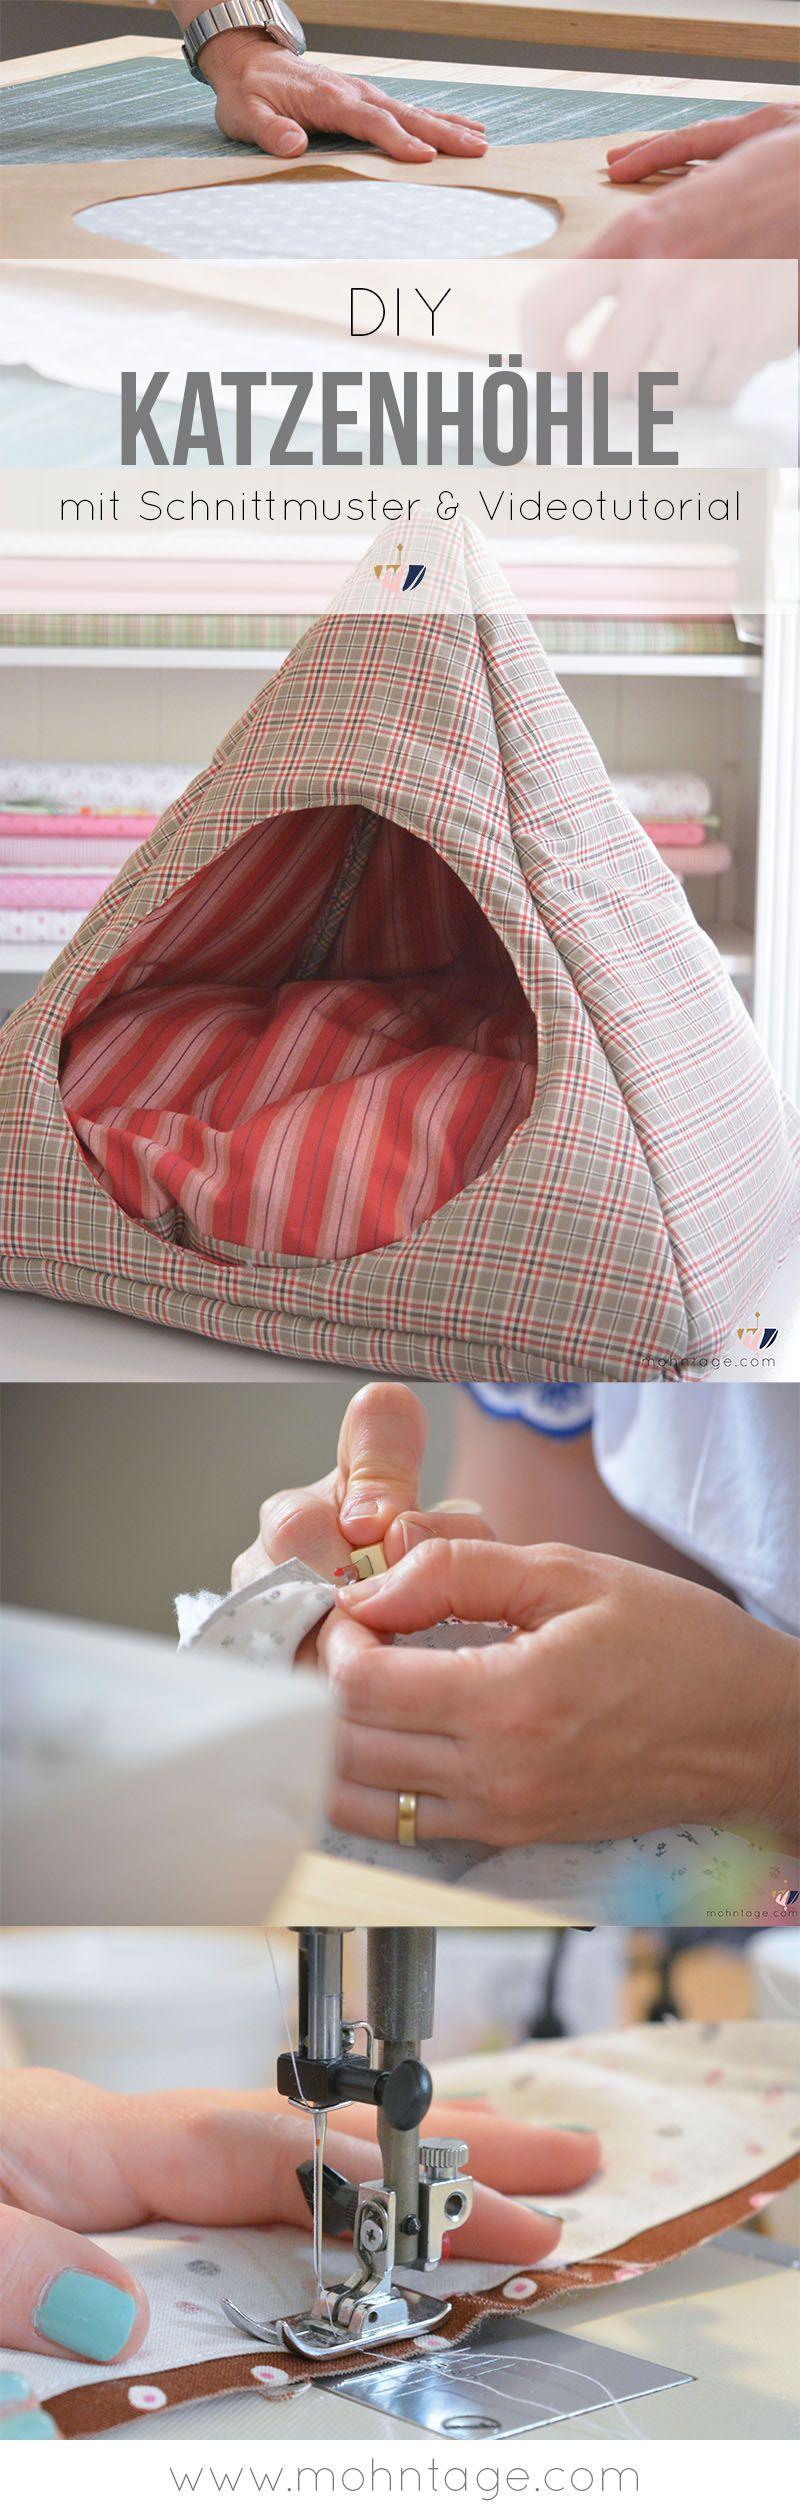 katzenhöhle selber machen | nähen | pinterest | sewing, diy und cats